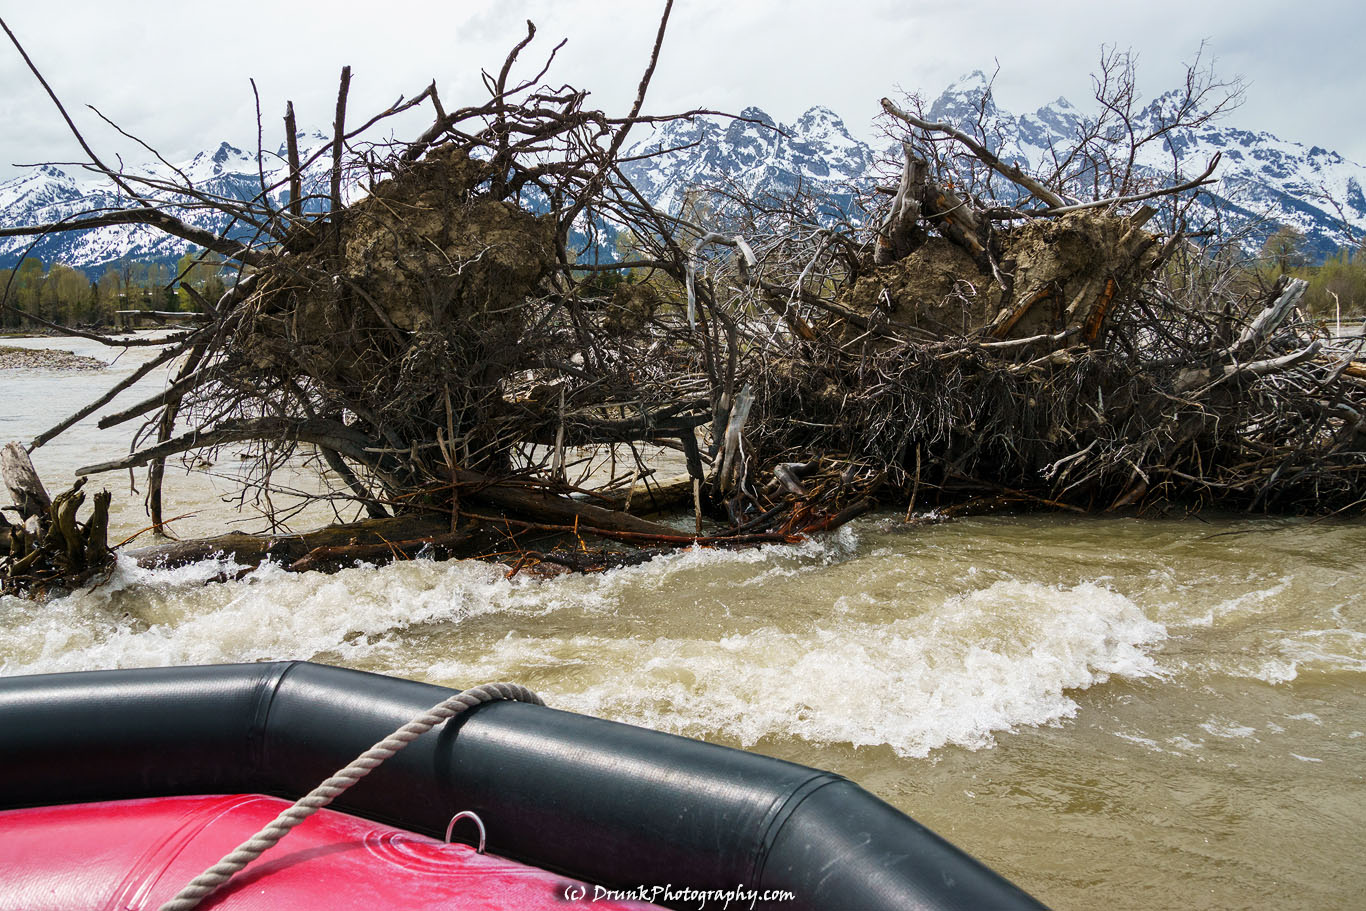 Snake River Drunkphotography.com